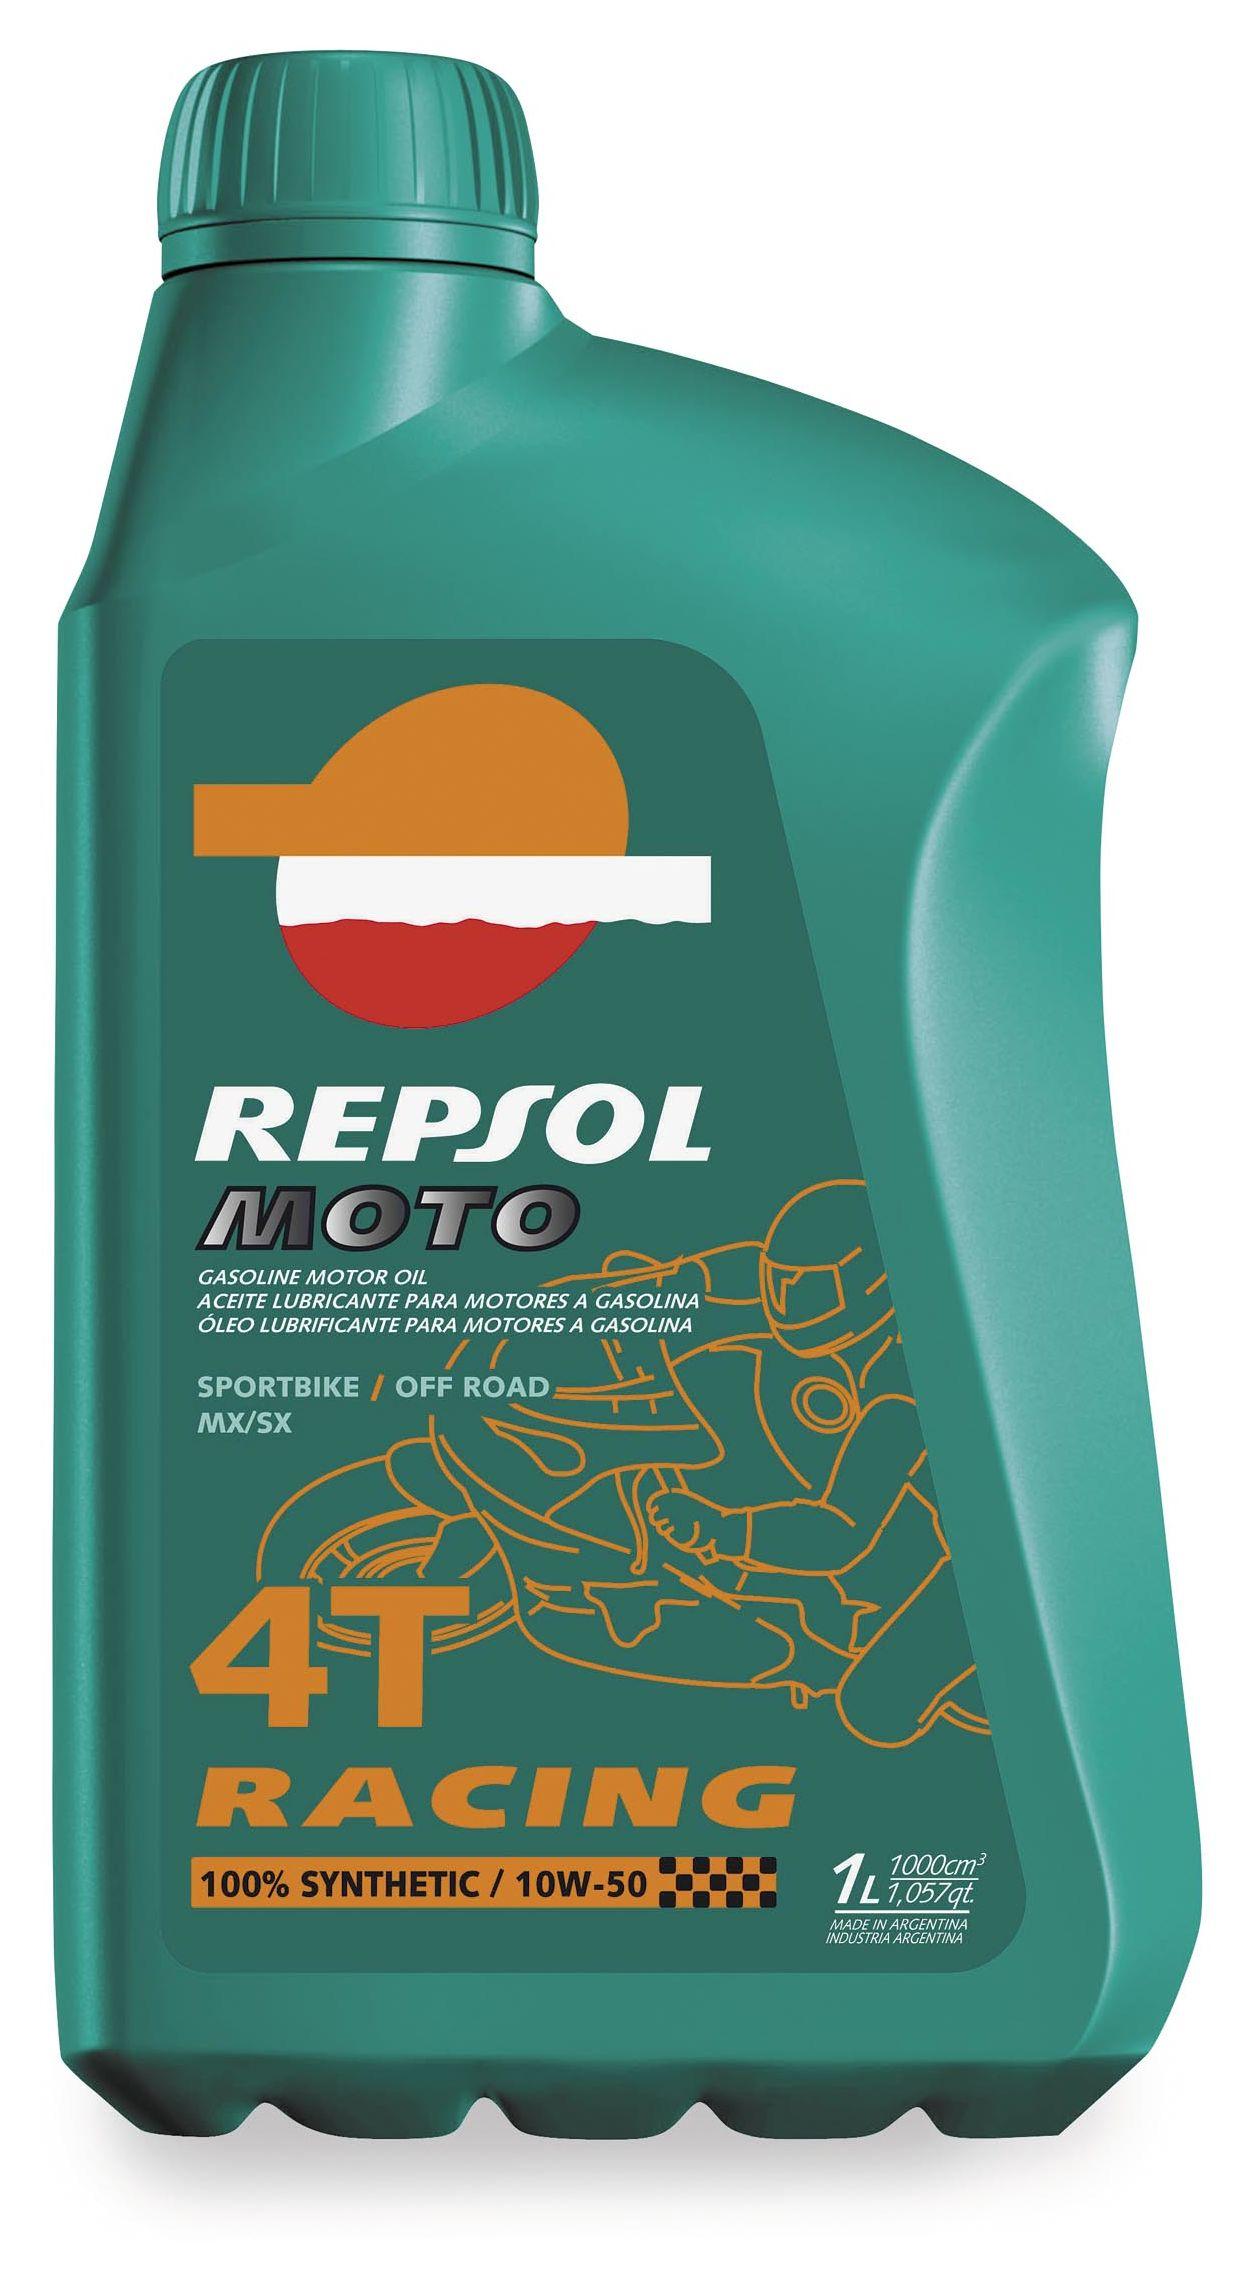 Repsol stock options